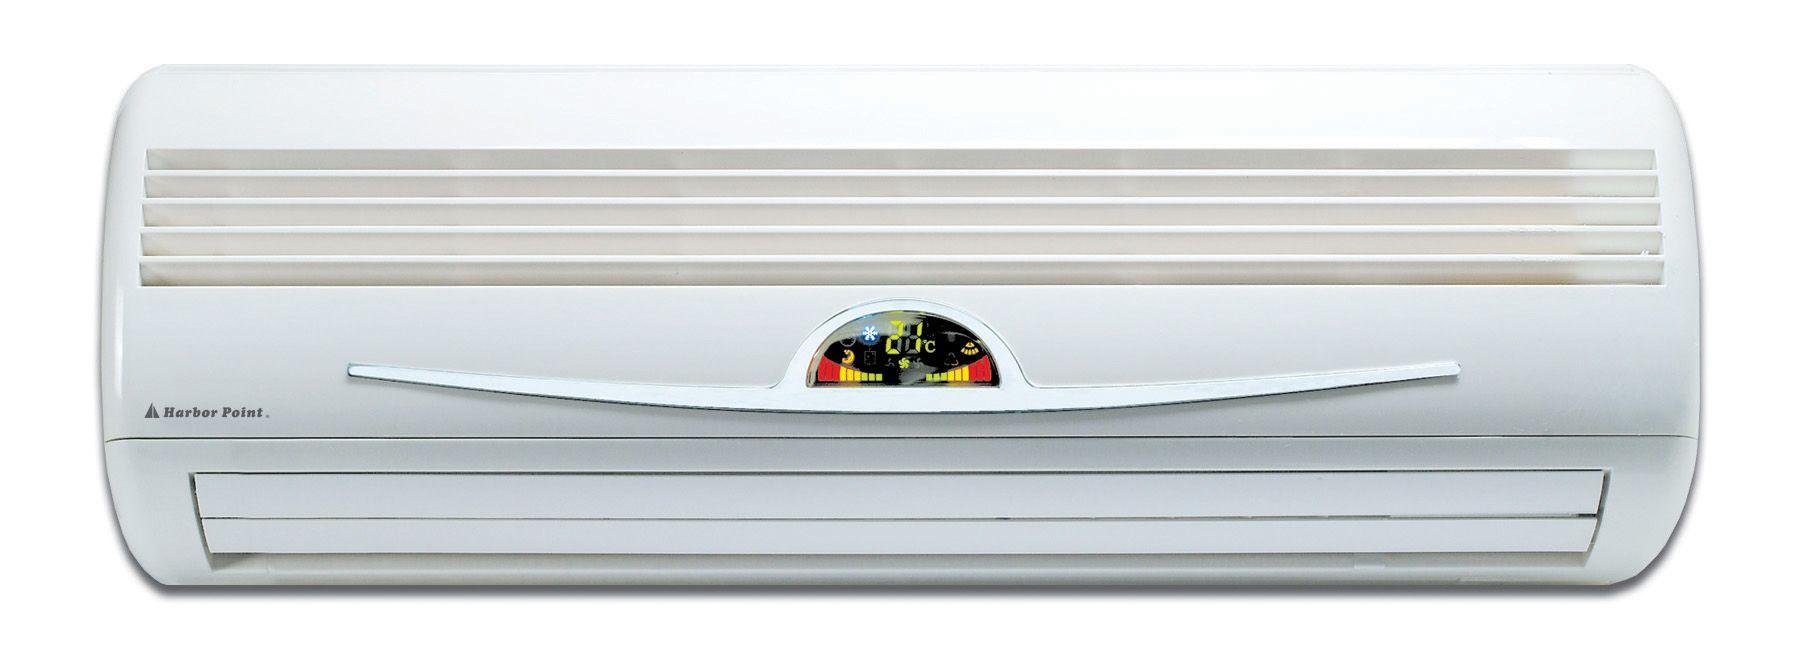 Harbor Point® Air Conditioner Heat Ductless Mini Split